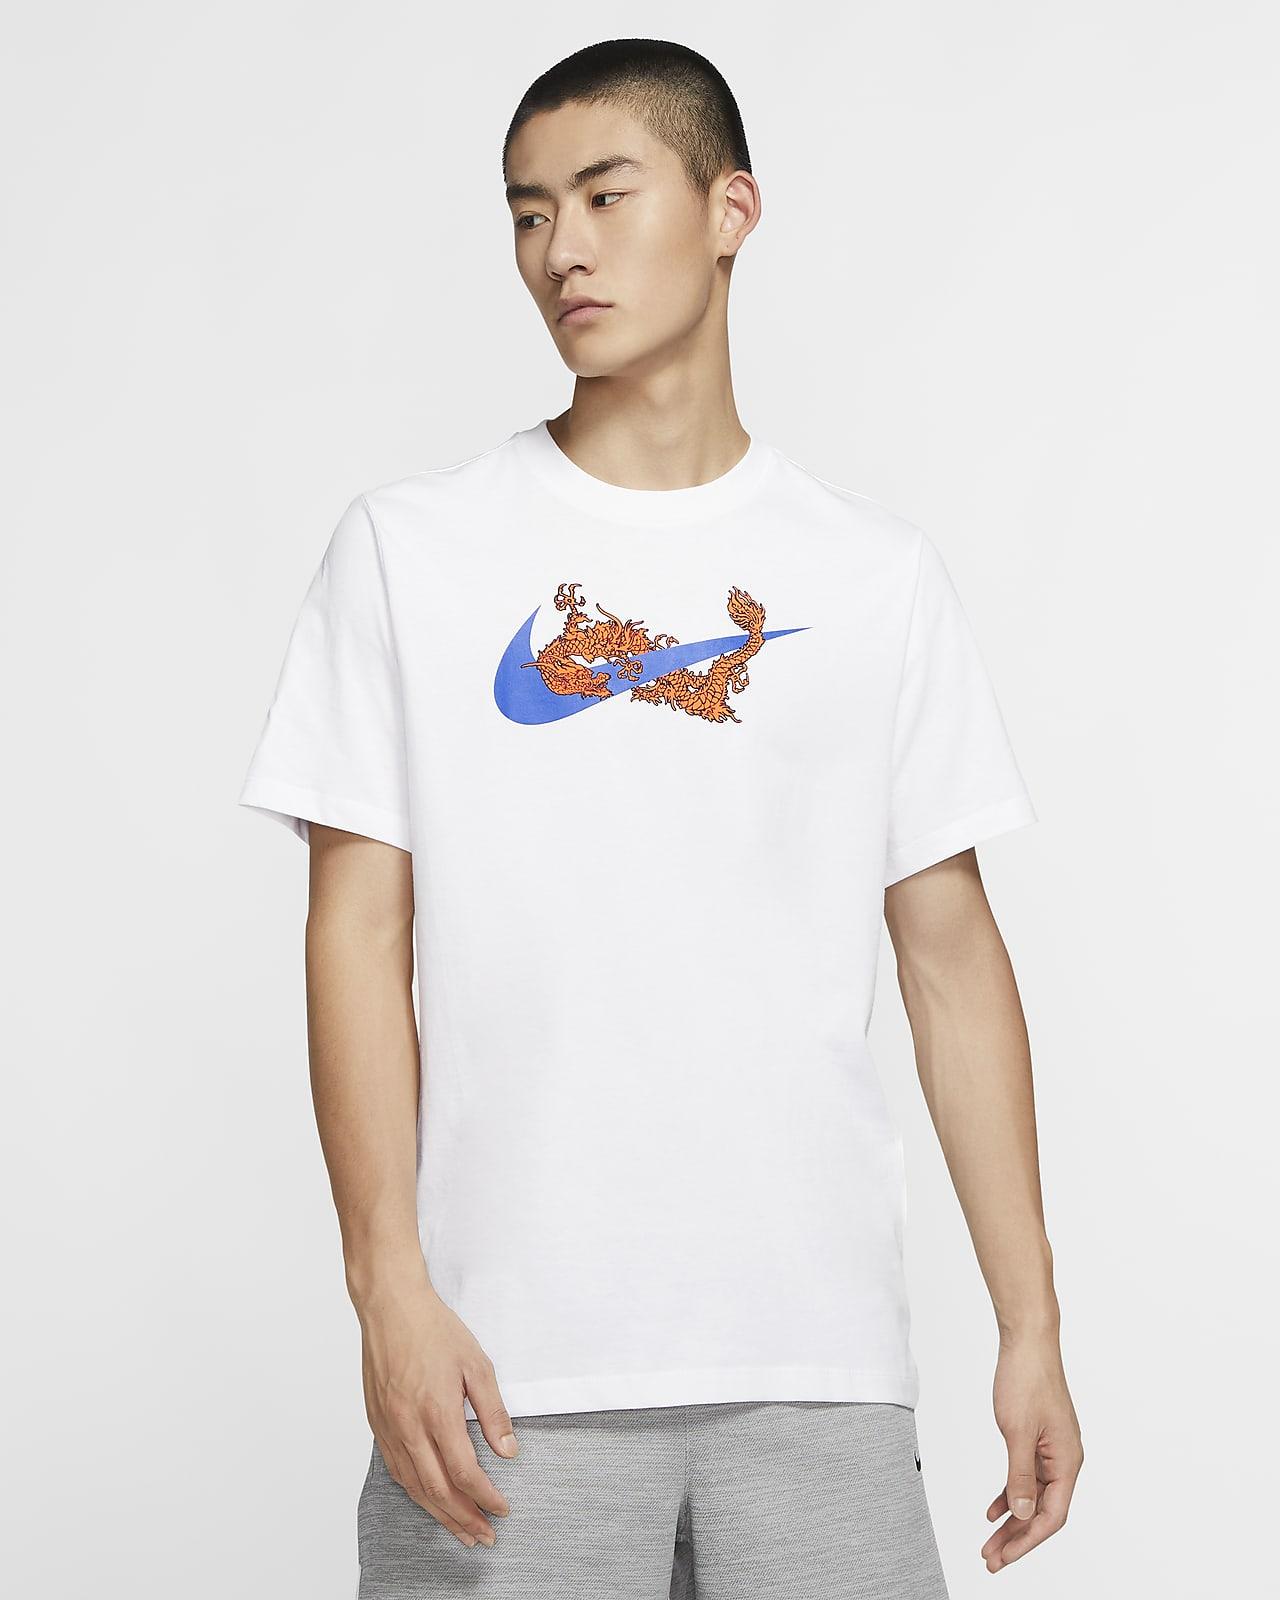 Nike Exploration Series Basketball-T-Shirt für Herren